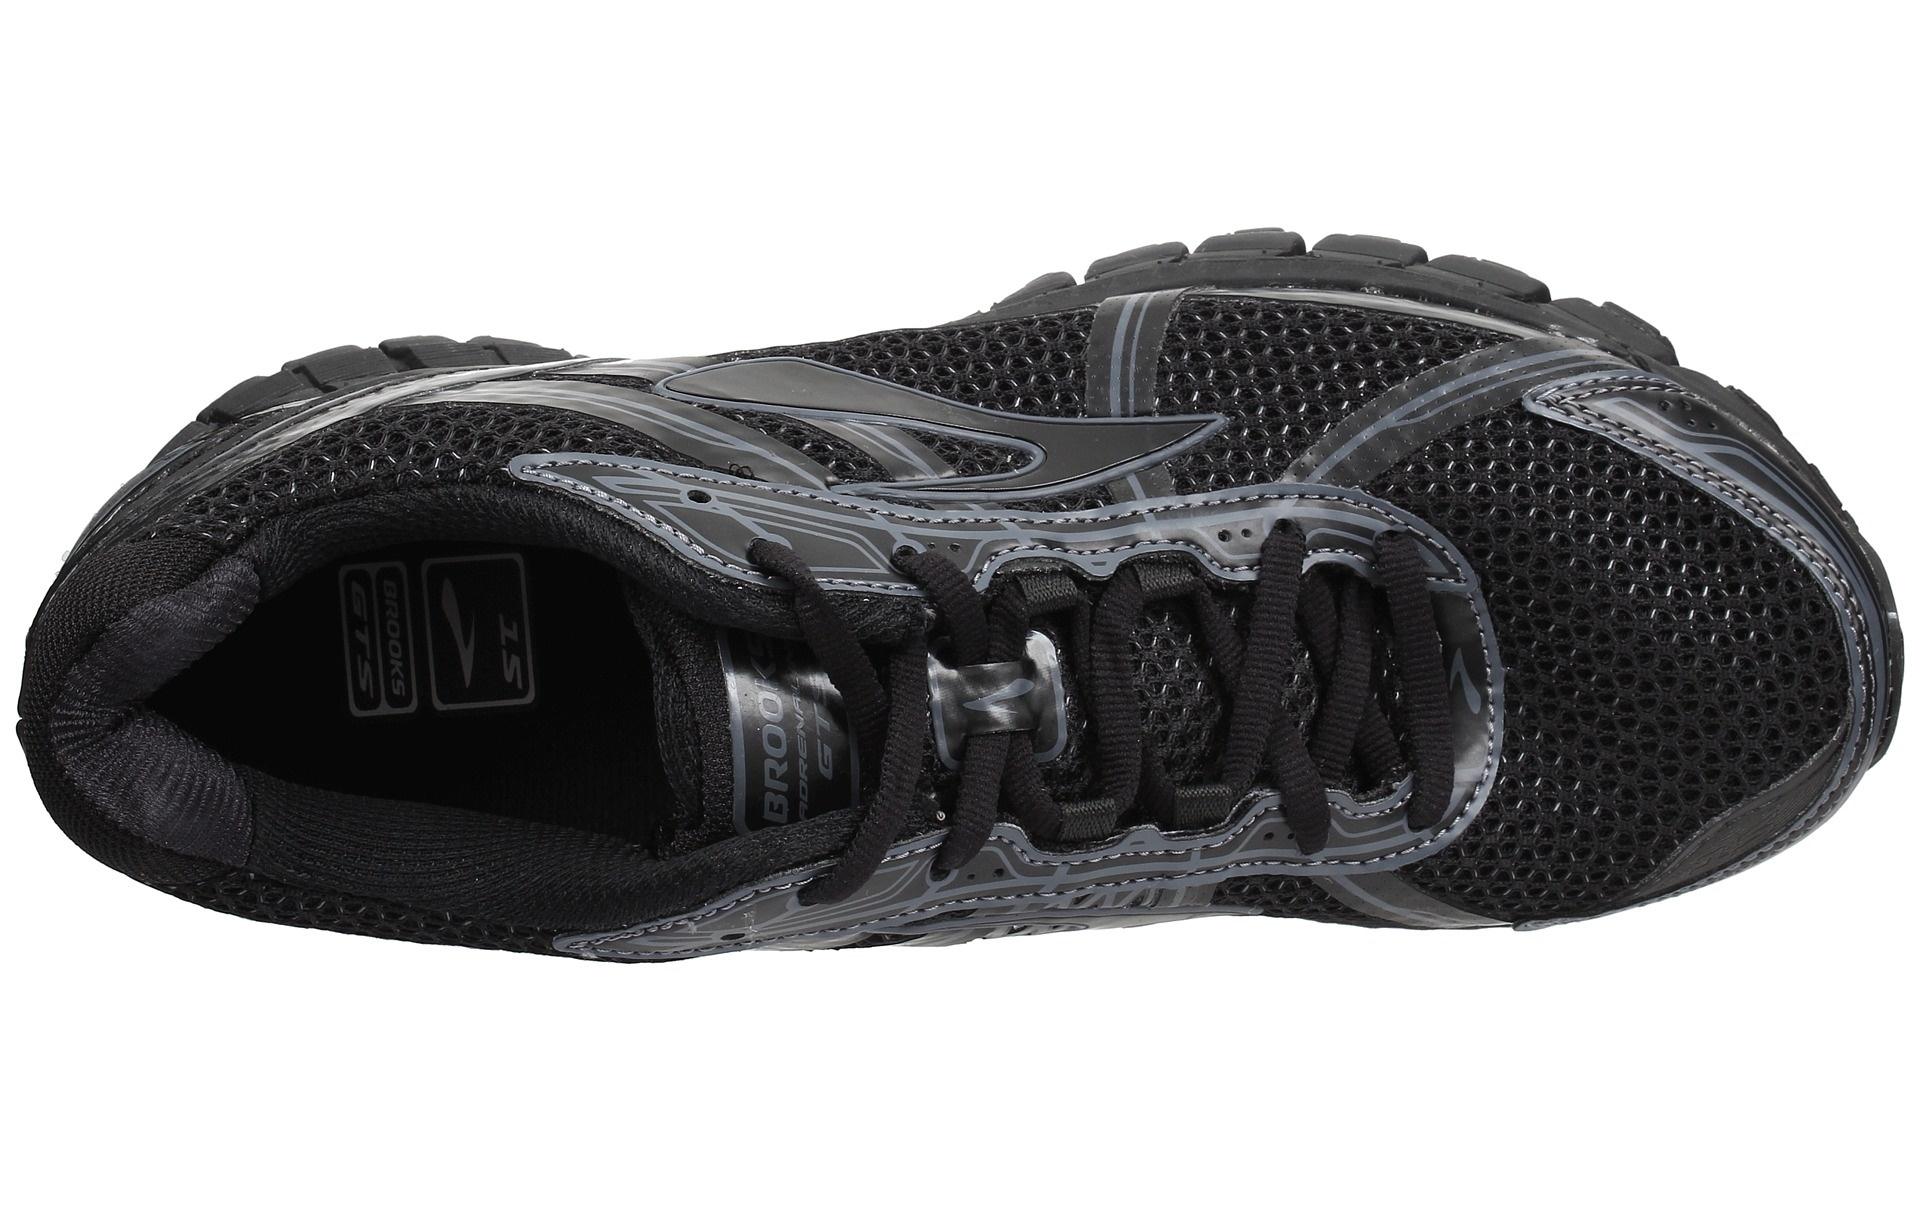 Мужские кроссовки для бега Brooks Adrenaline Gts 15 (101811D068) фото